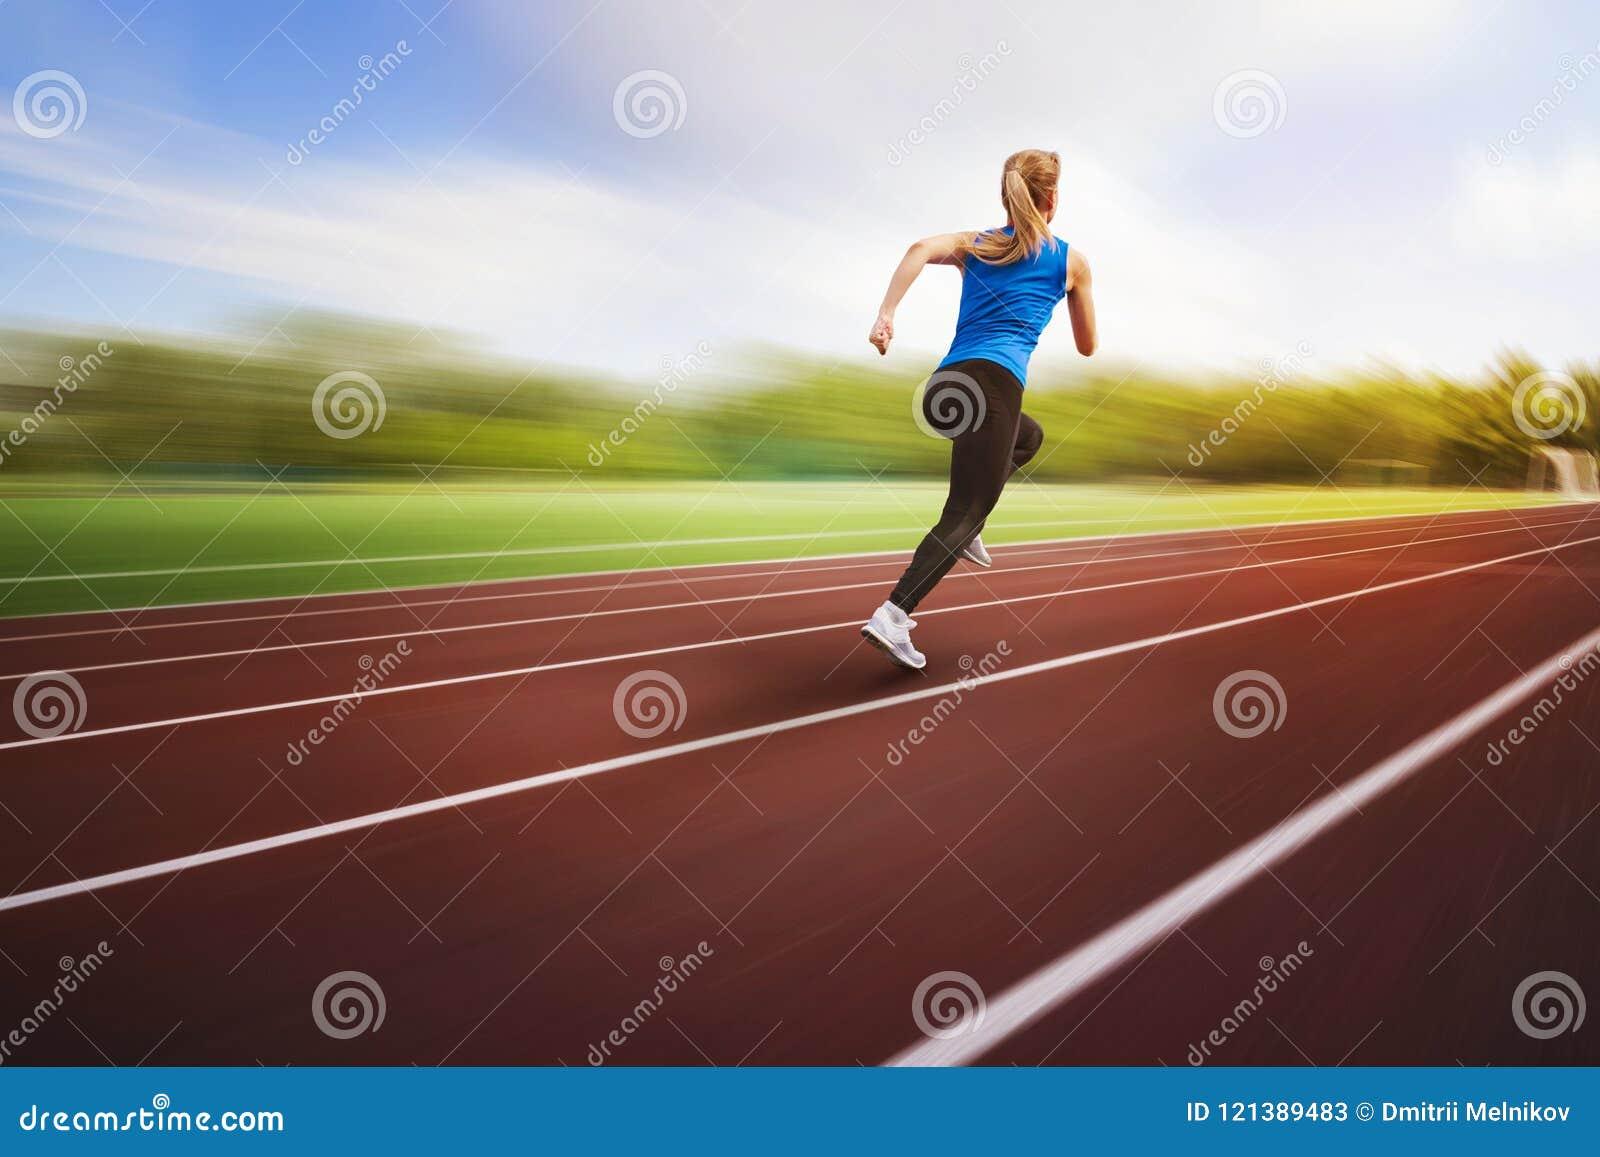 Free Runs Good For Track | Provincial Archives of Saskatchewan